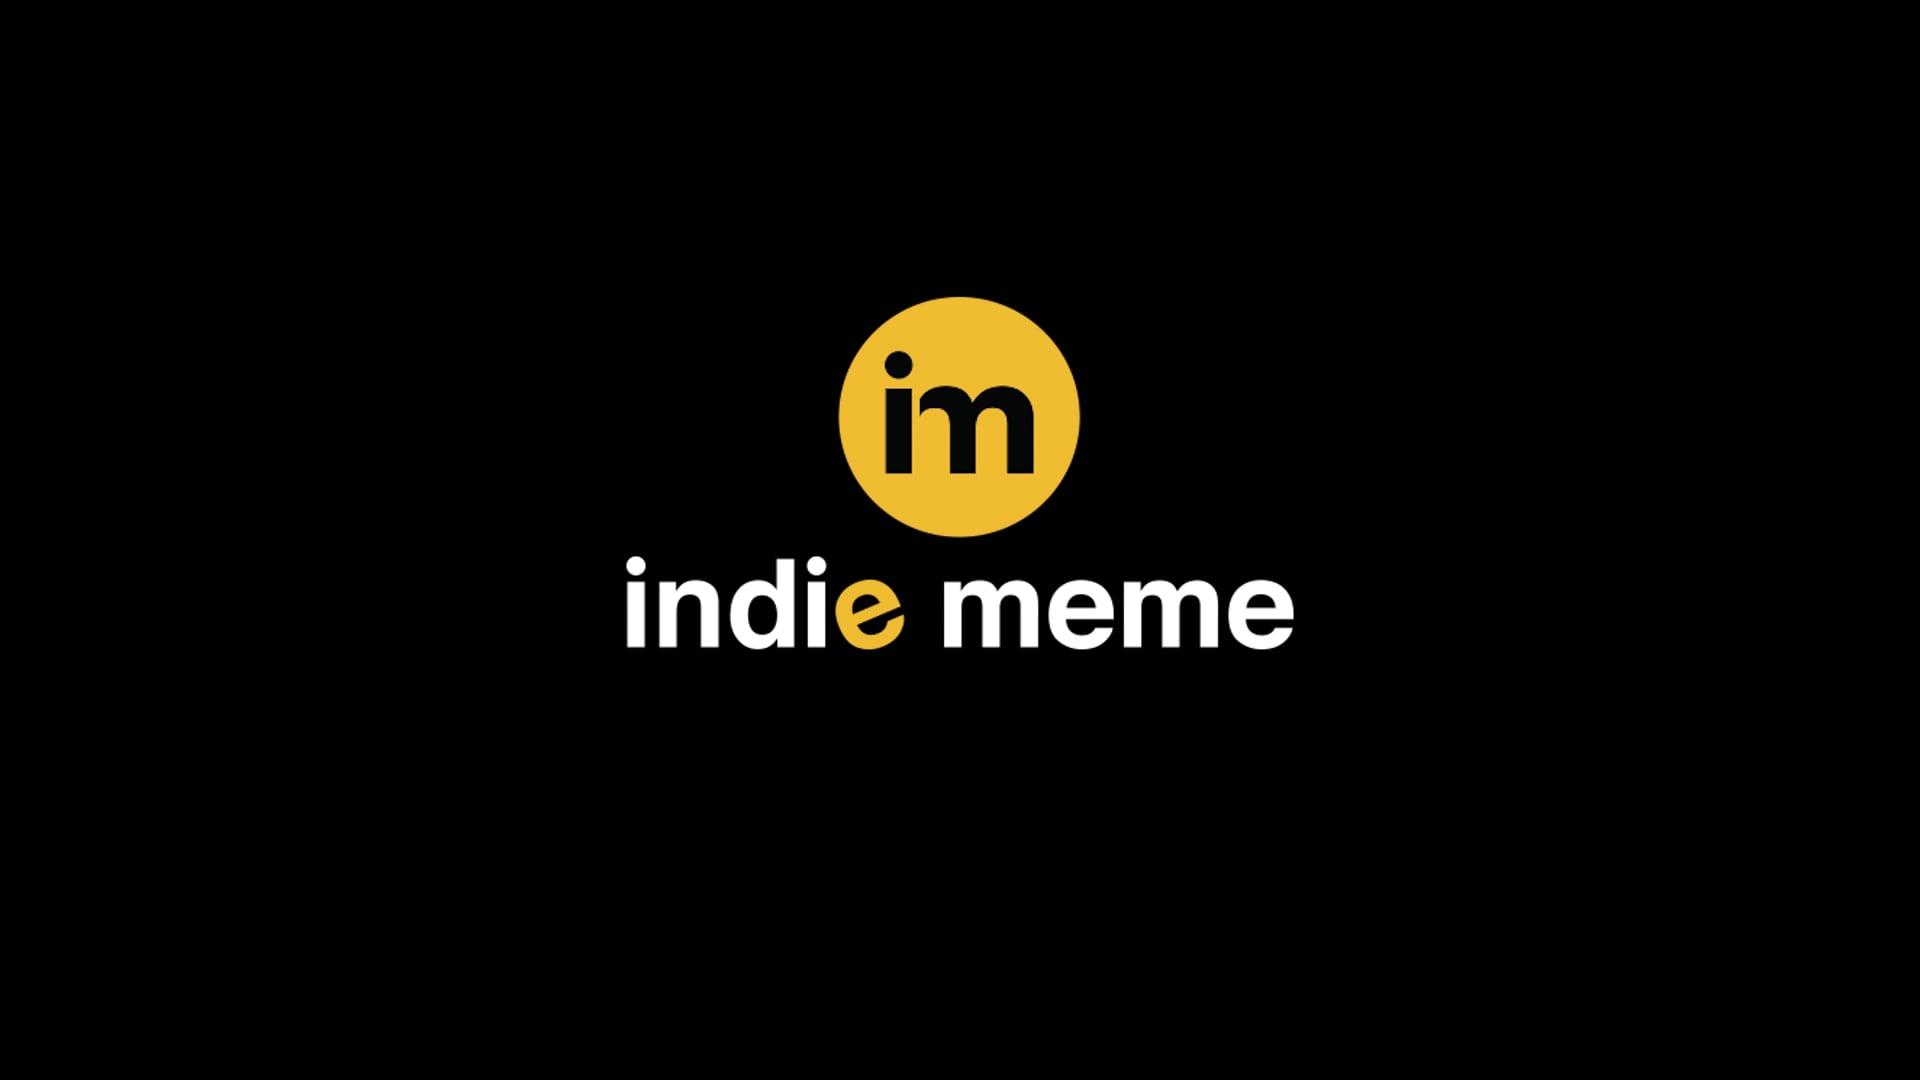 Indie Meme 2021 - Save the Date